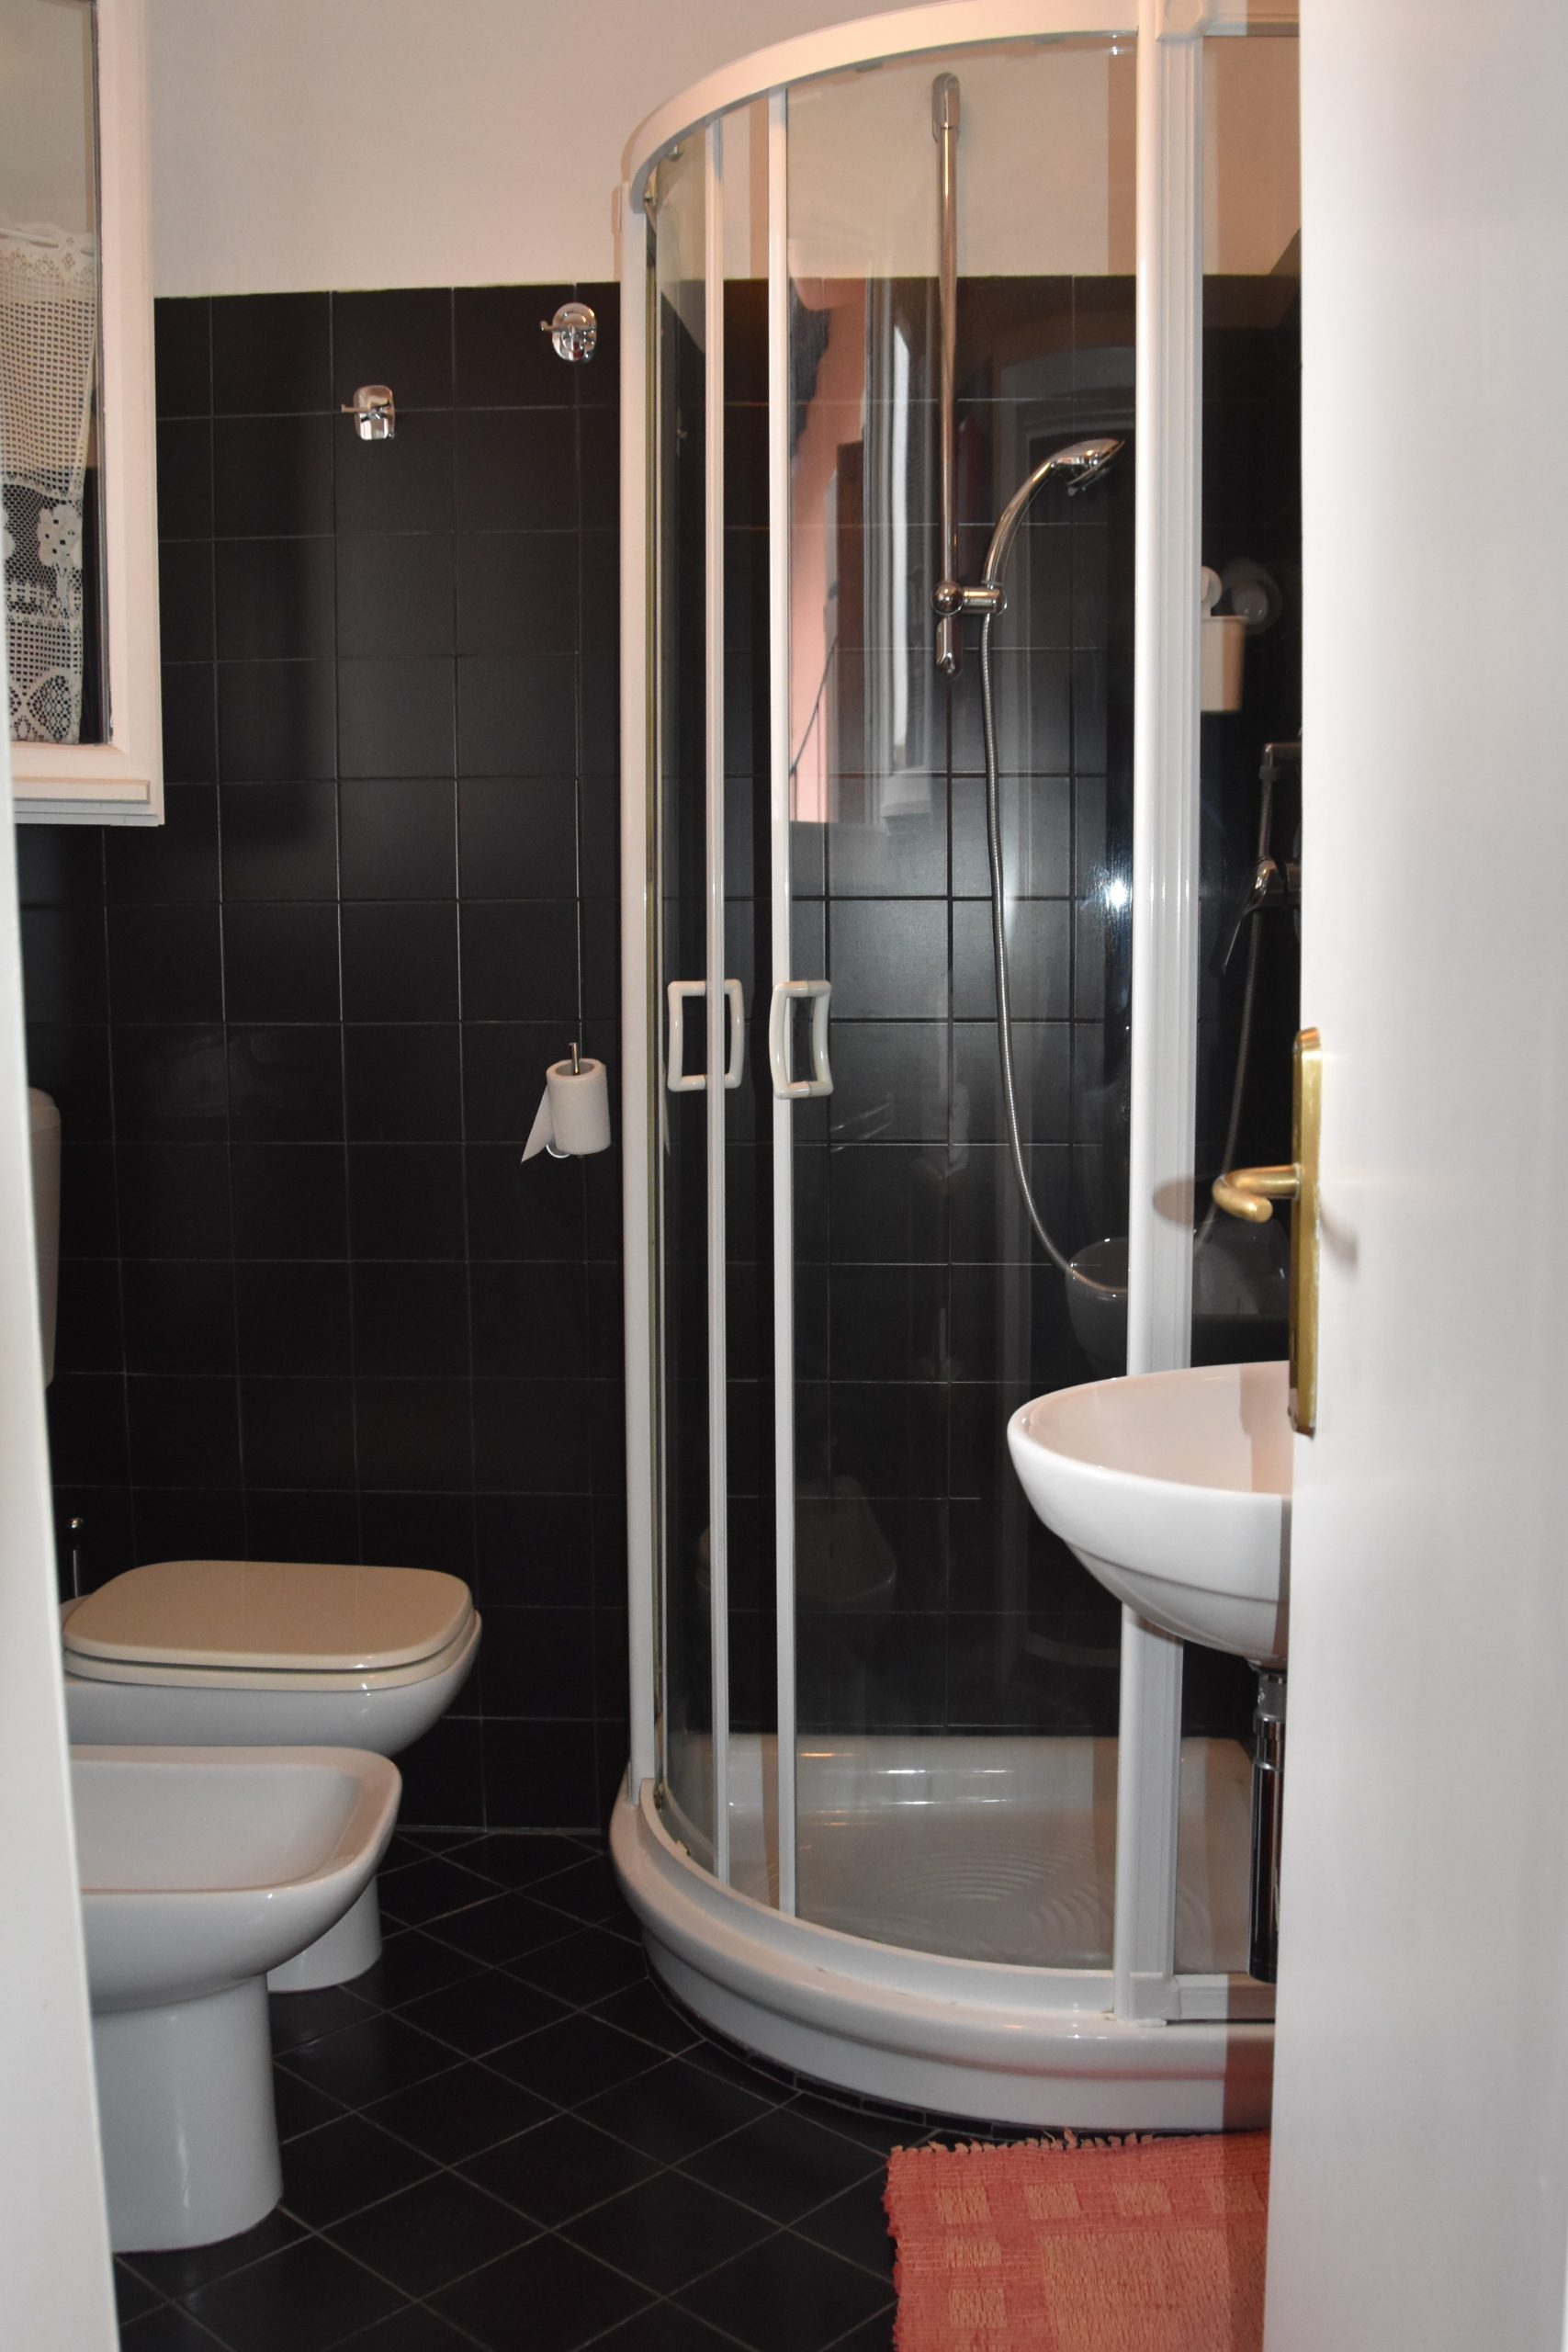 appartamentoernani-bebalducale-parma-bagno